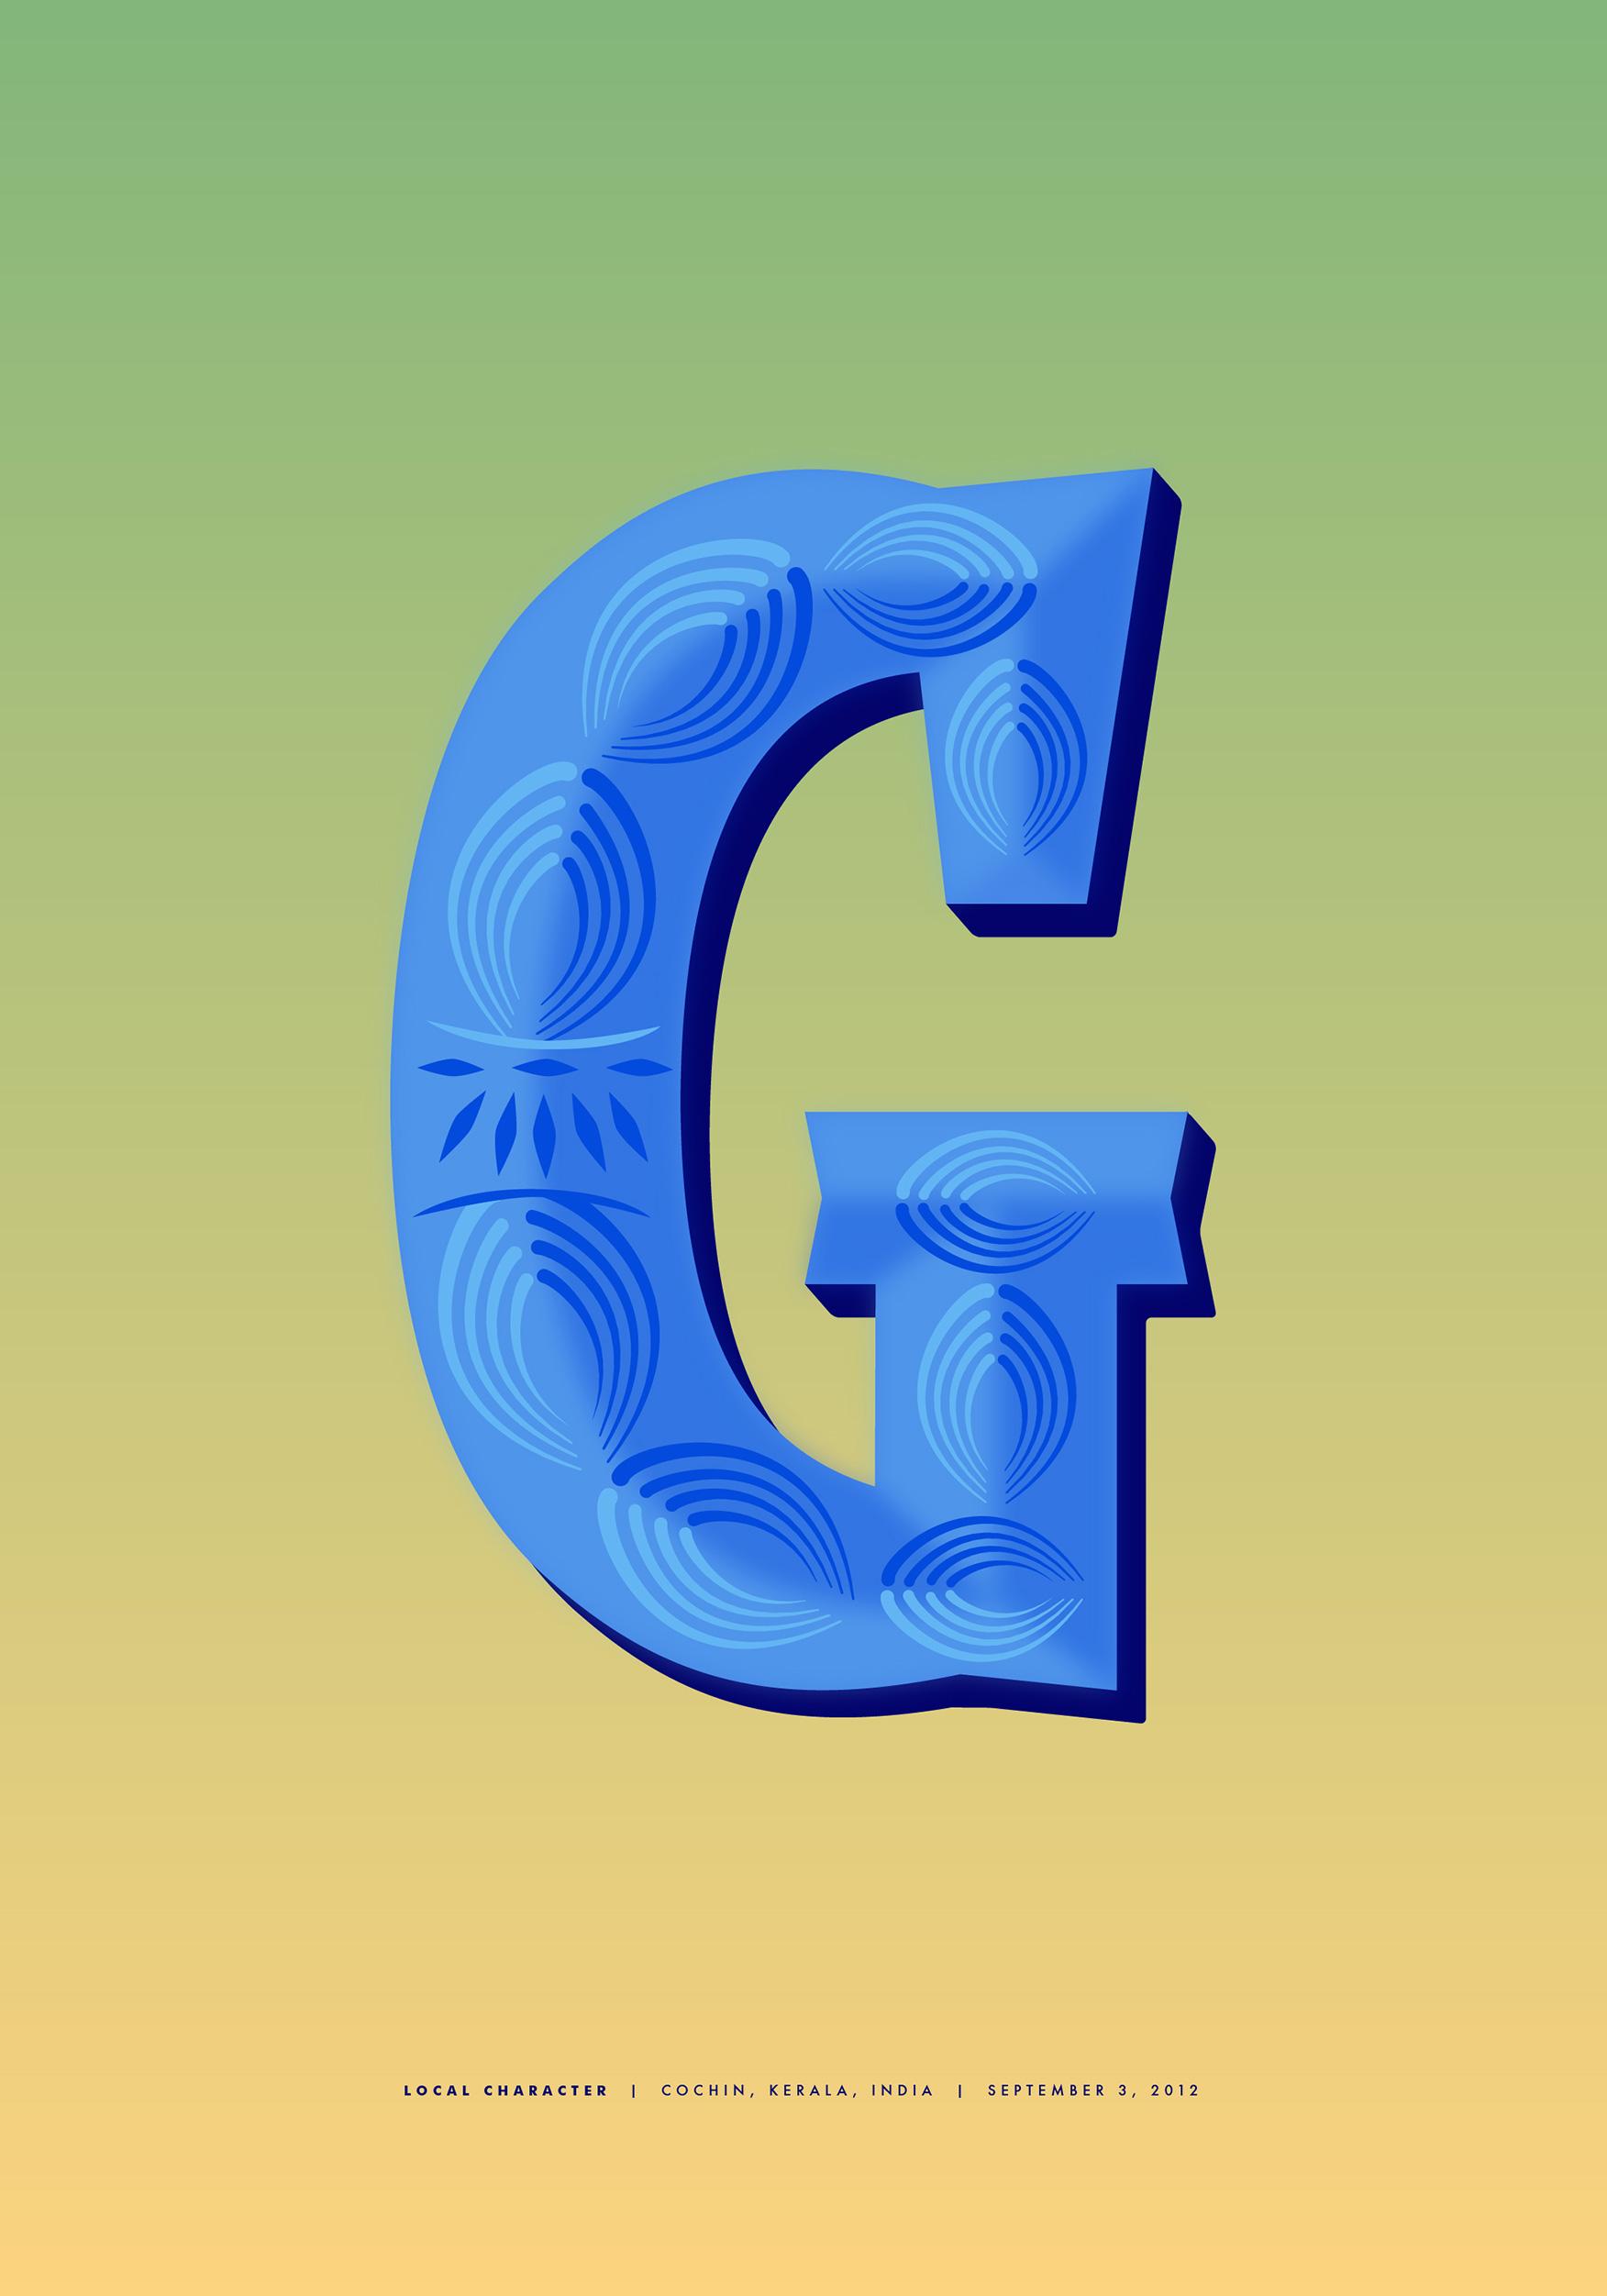 Kerala-Alphabet-G.jpg